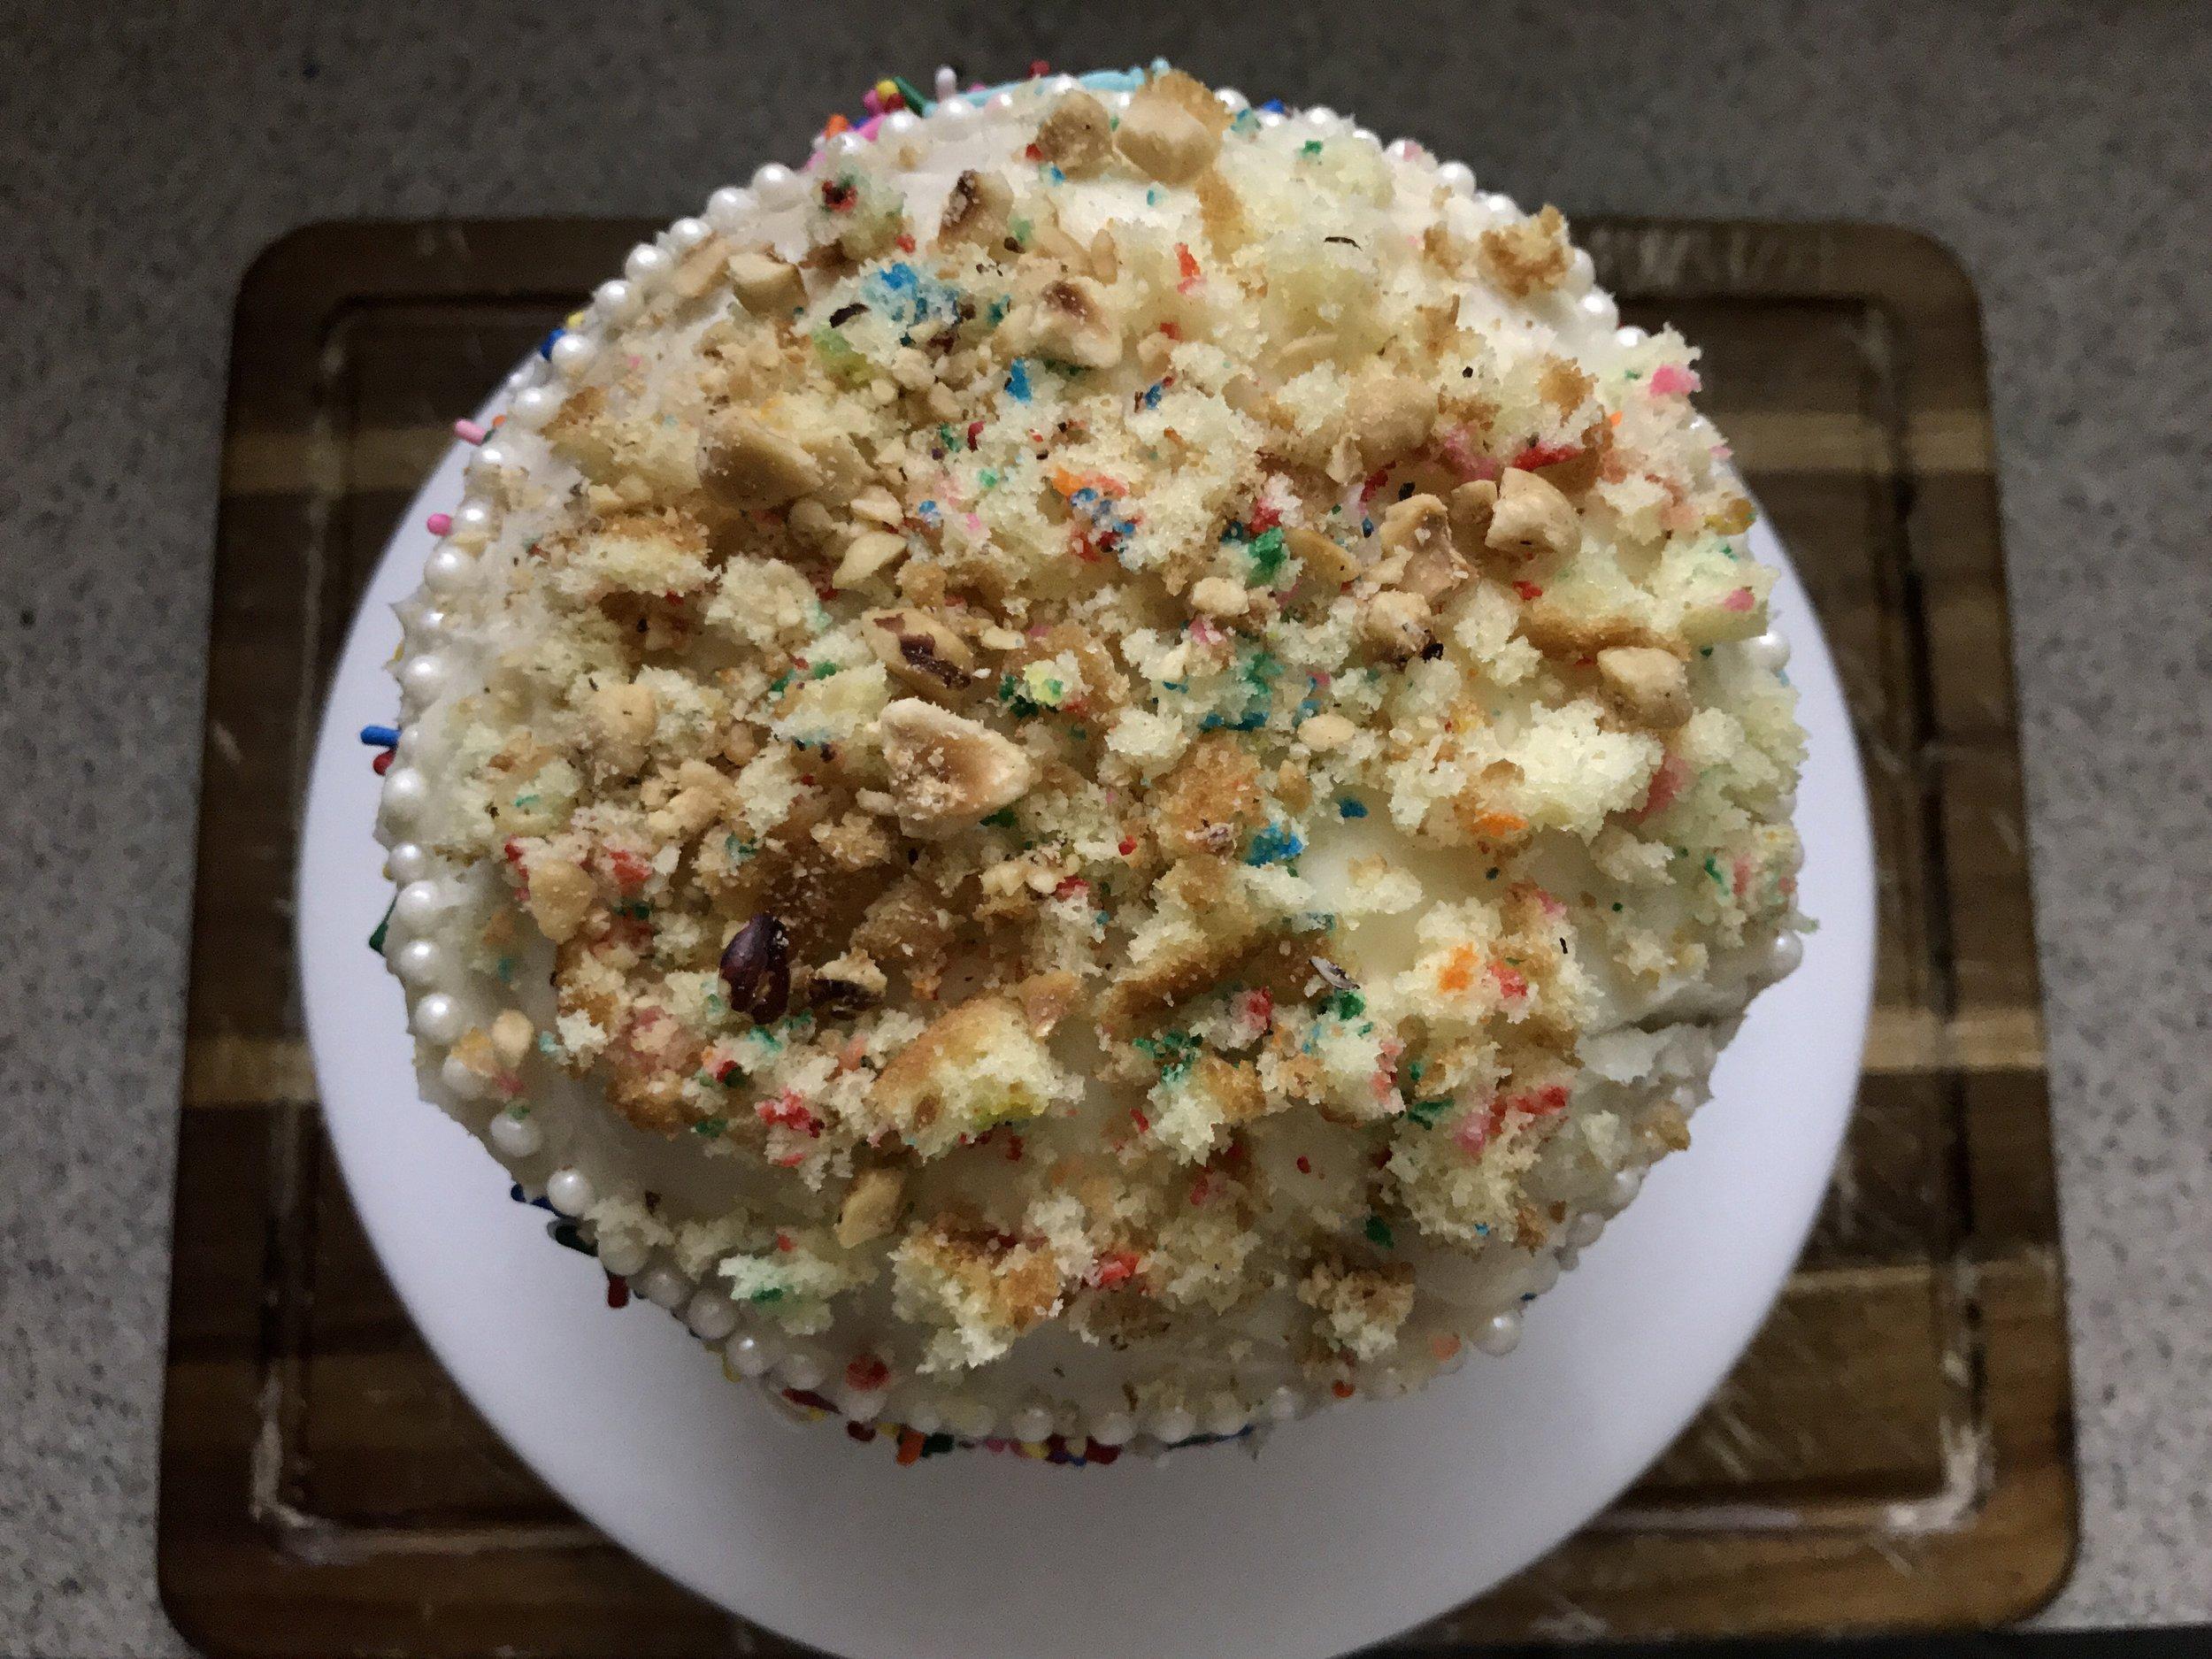 birthdaycake (8).jpg